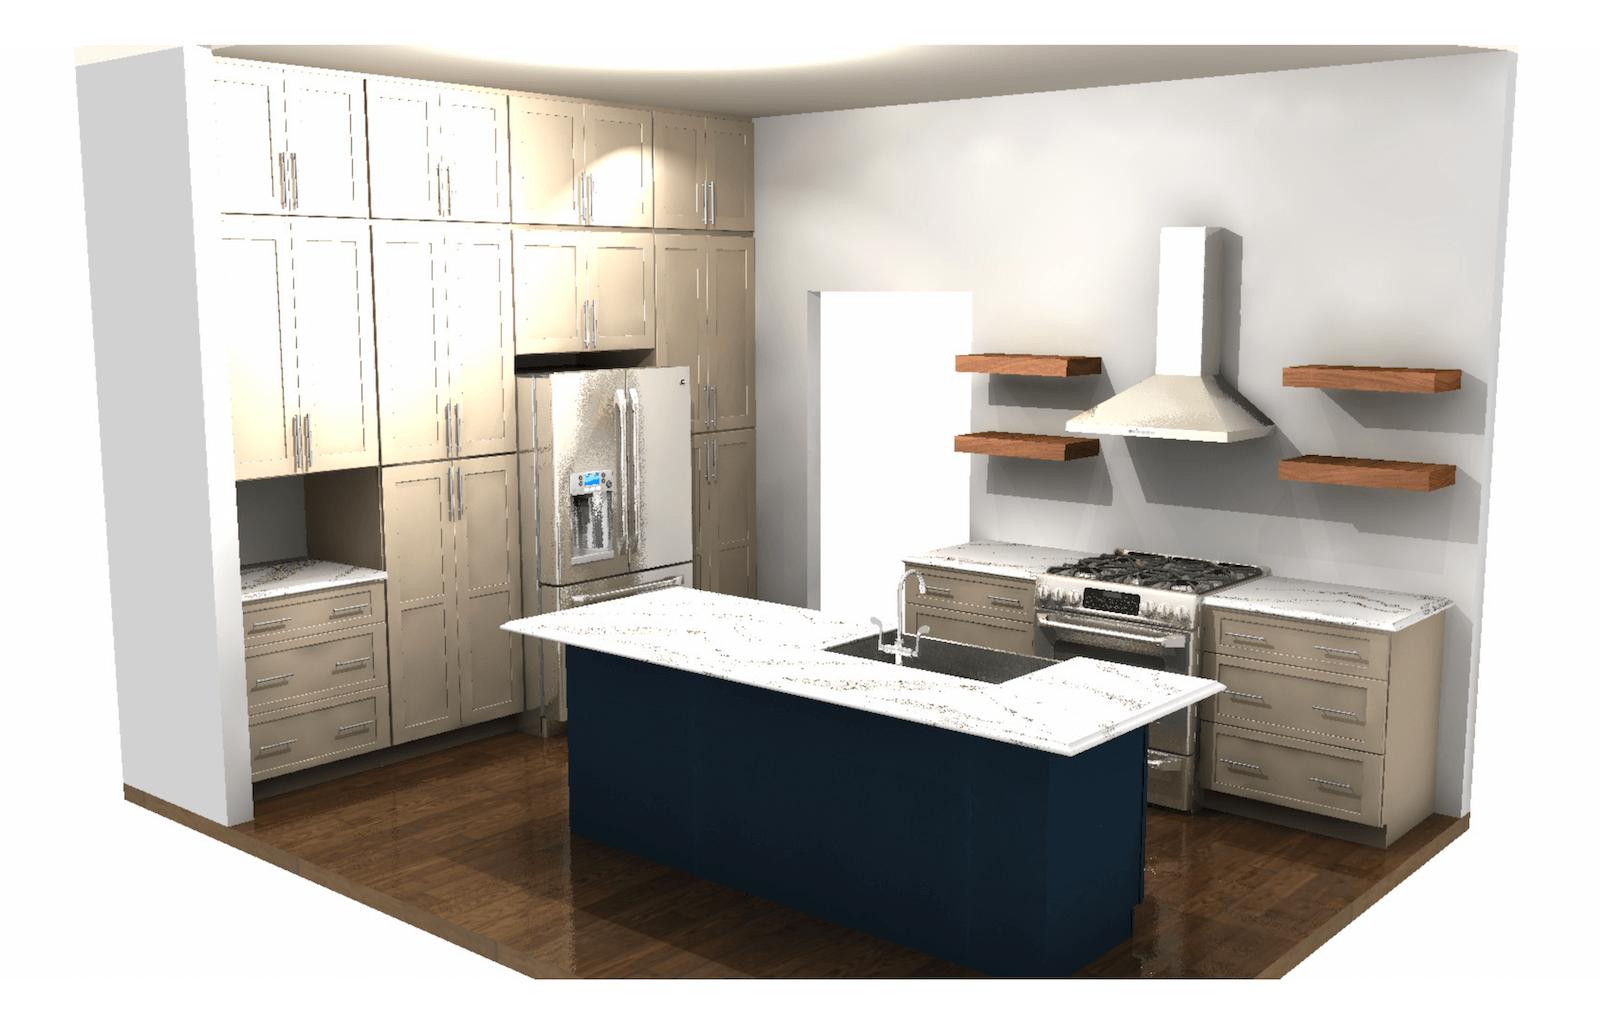 Kitchen Rendering Full View